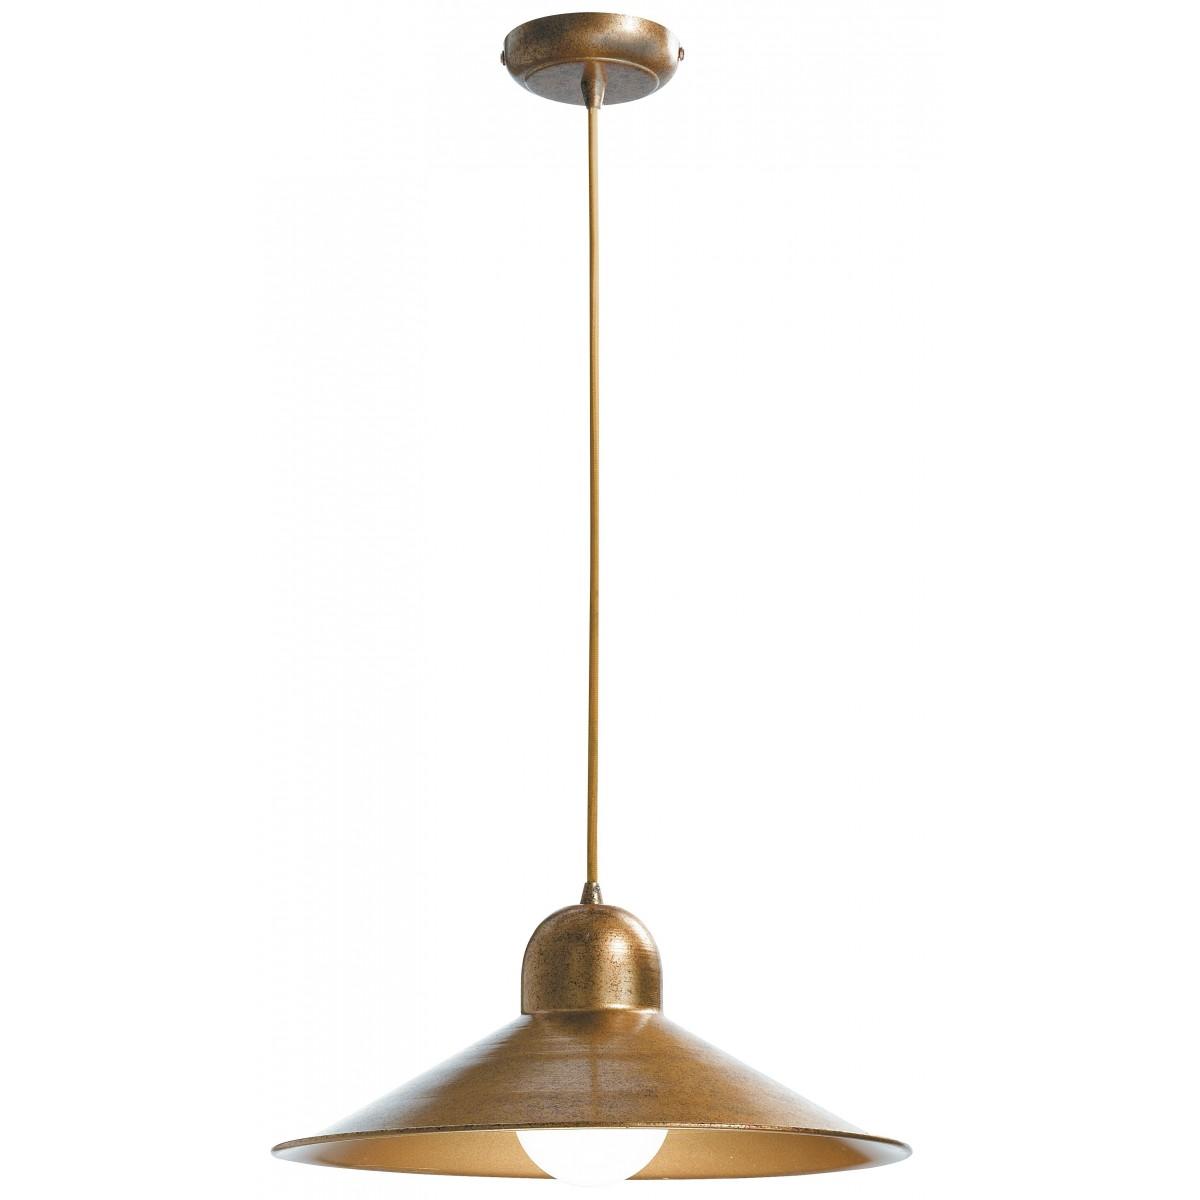 I-ORLEANS/S1 - Lampadario Sospensione Rame paralume Metallo Rustico Vintage E27